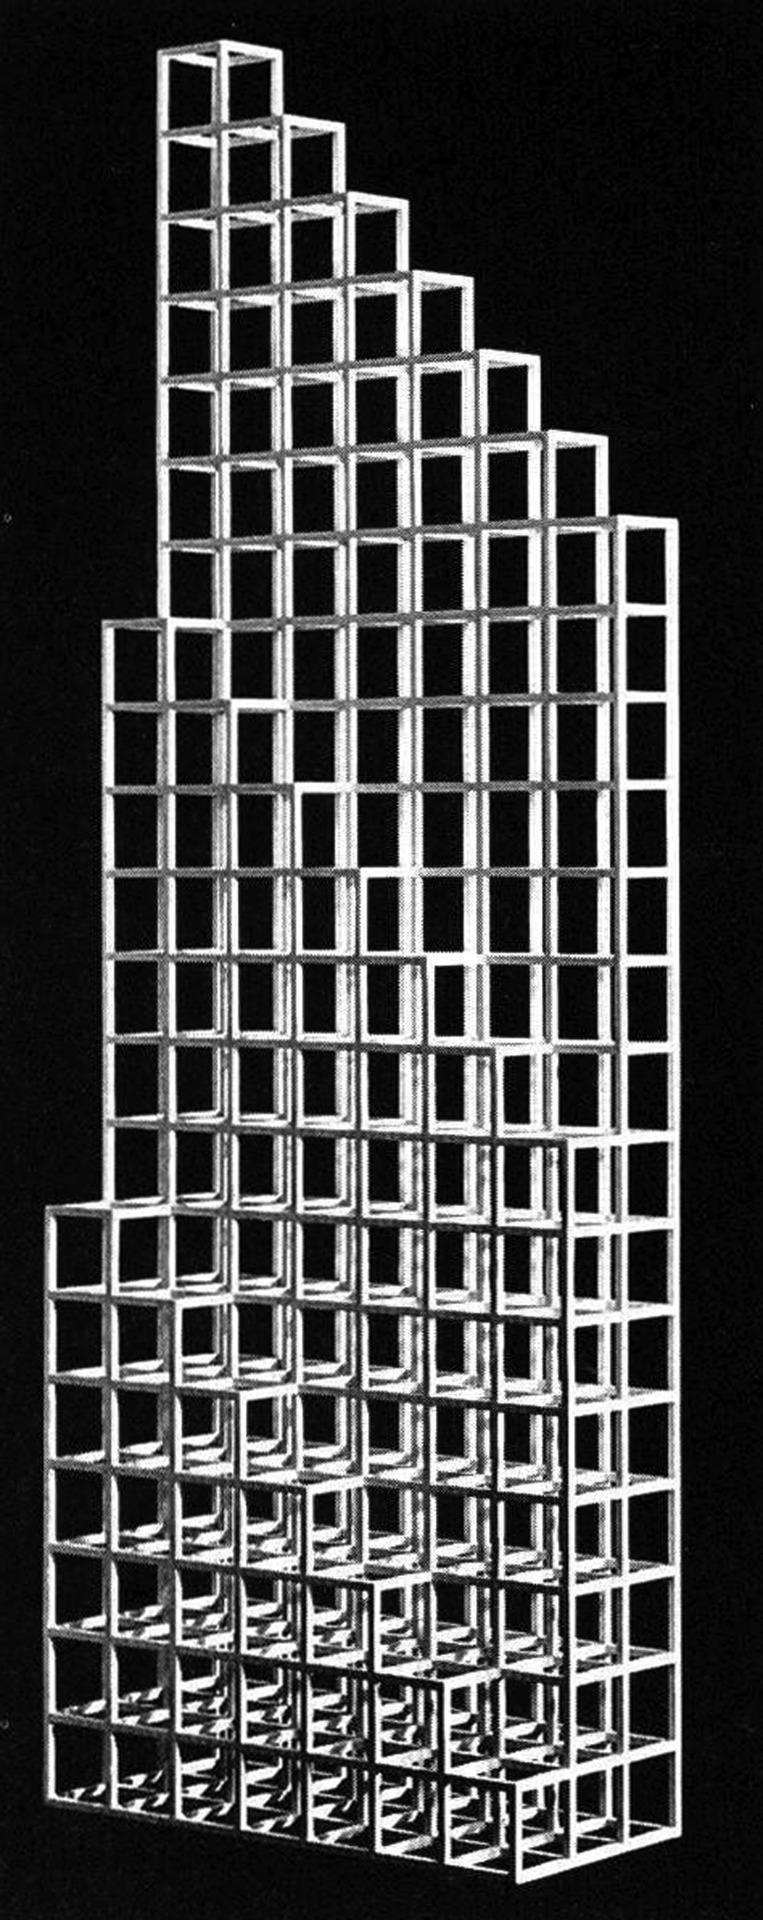 archiveofaffinities: Sol Lewitt, 21B, 1989